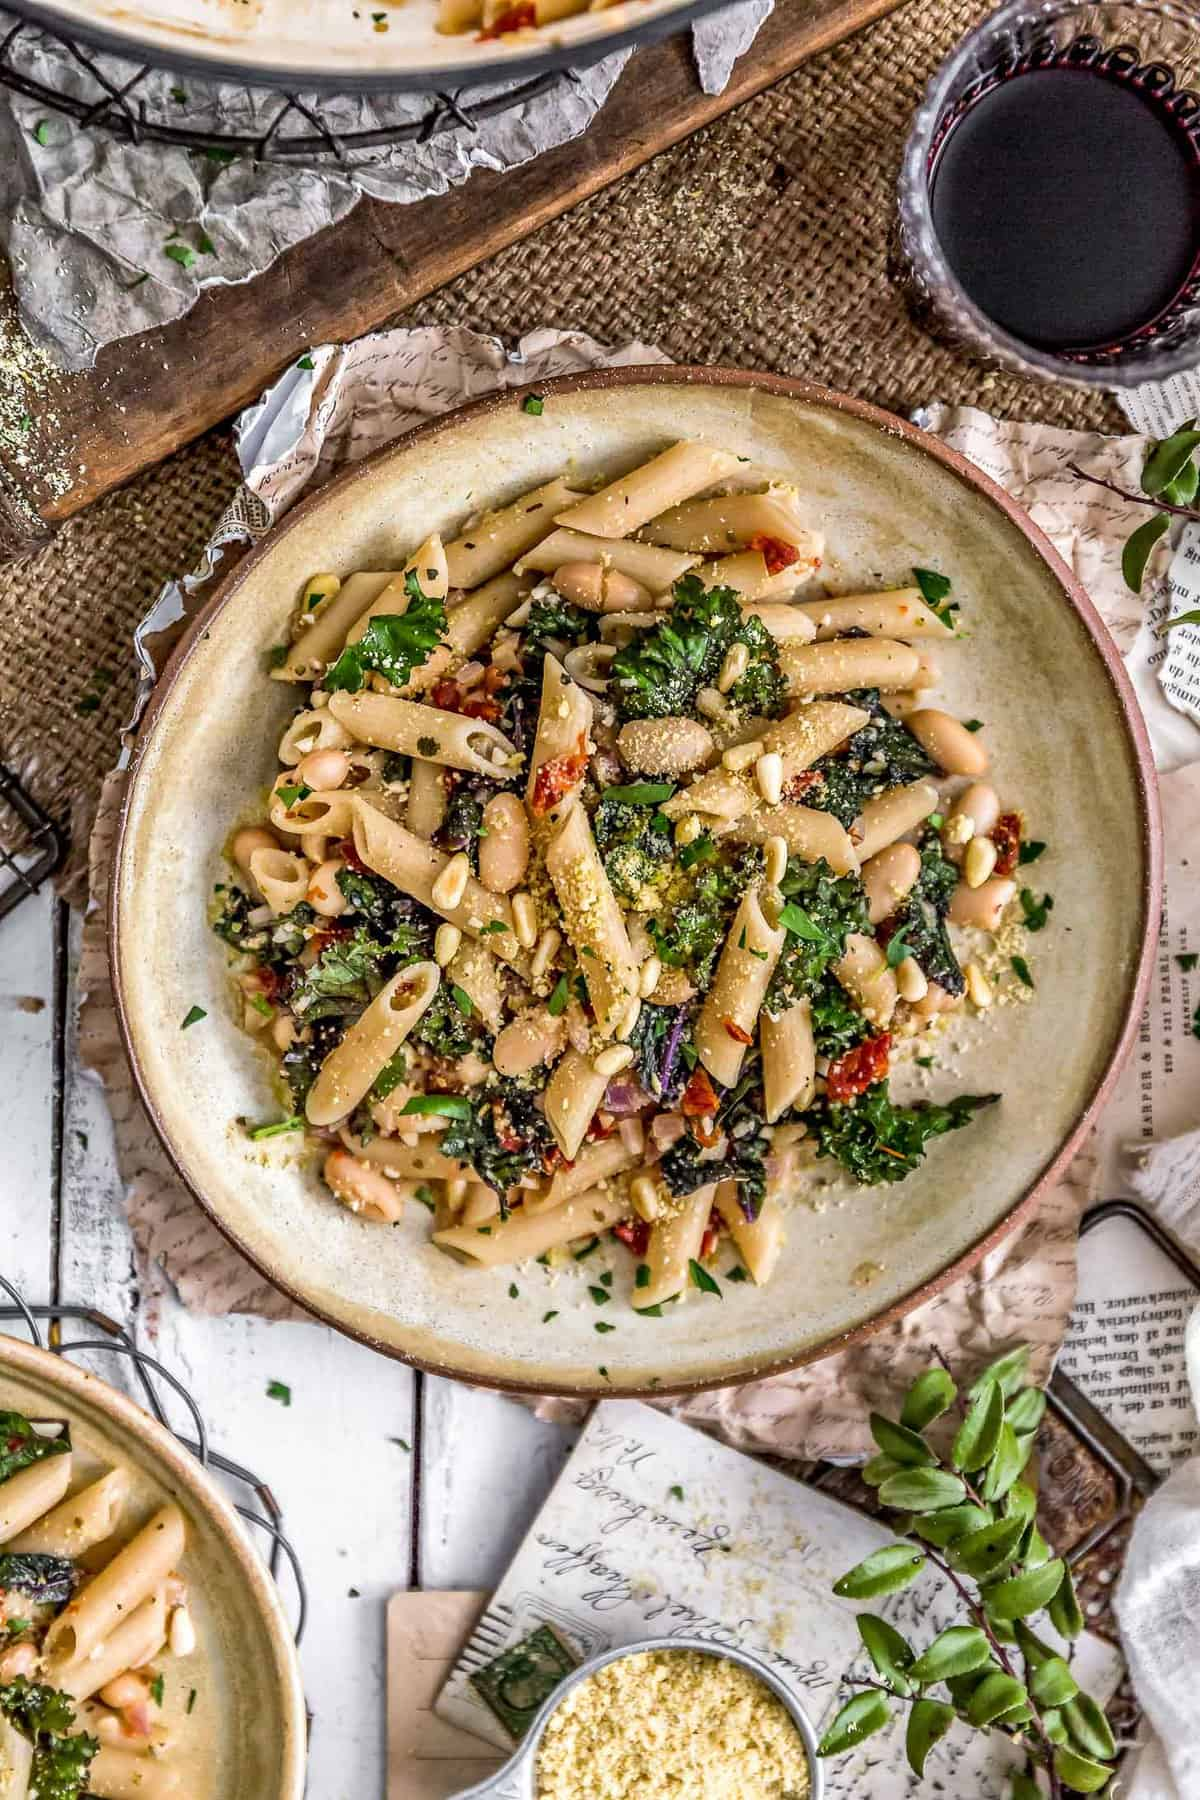 Italian Pasta and Kale